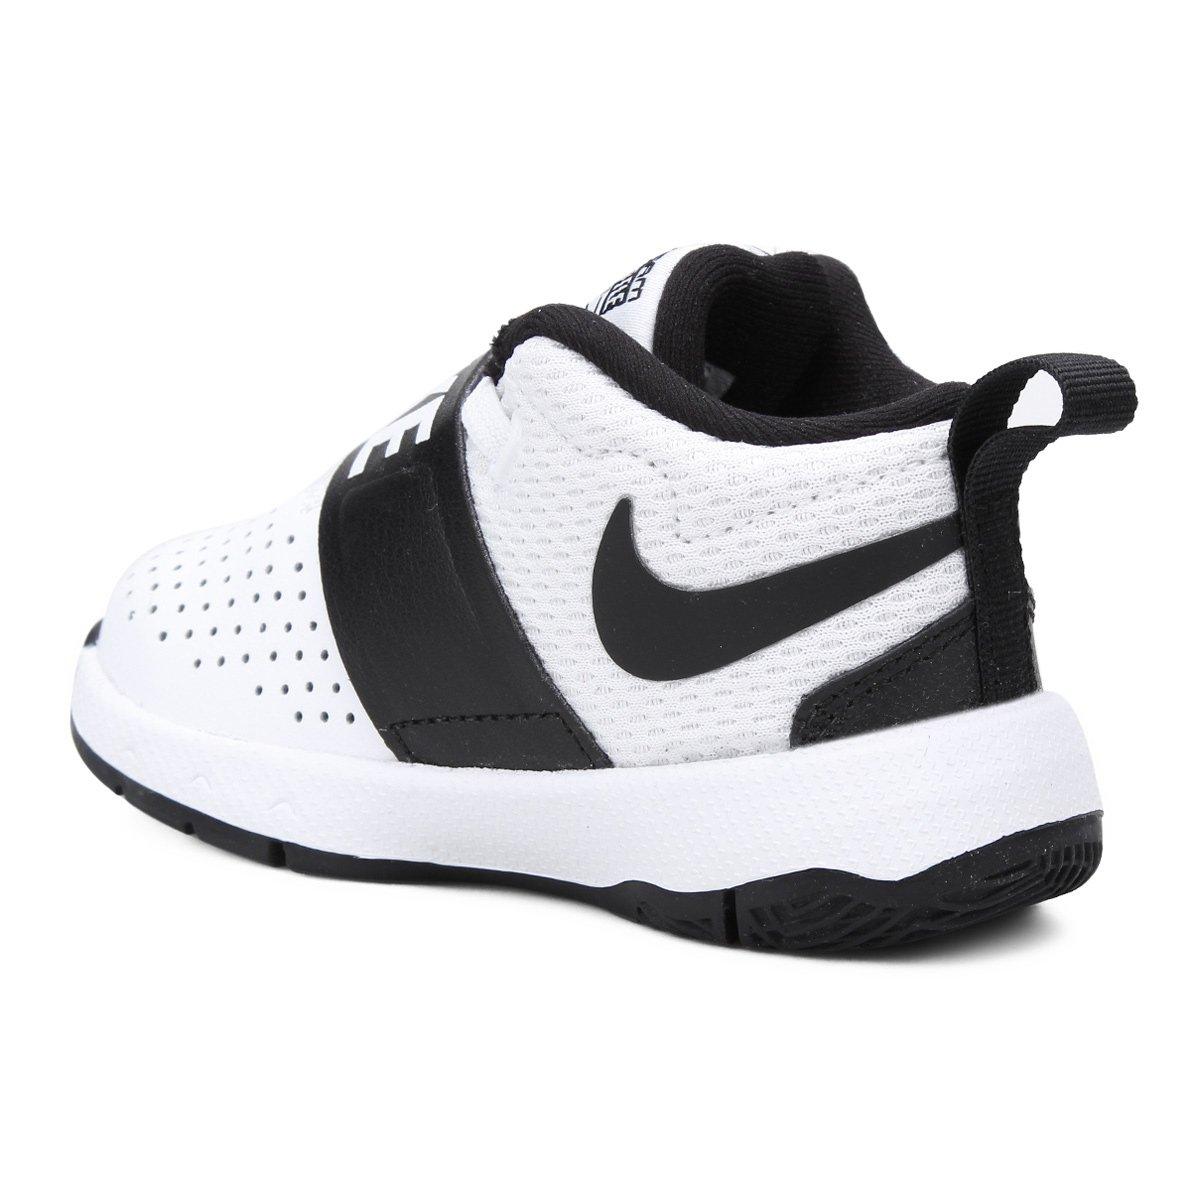 2974bb91701 ... Foto 3 - Tênis Infantil Couro Nike Team Hustle D Masculino ...